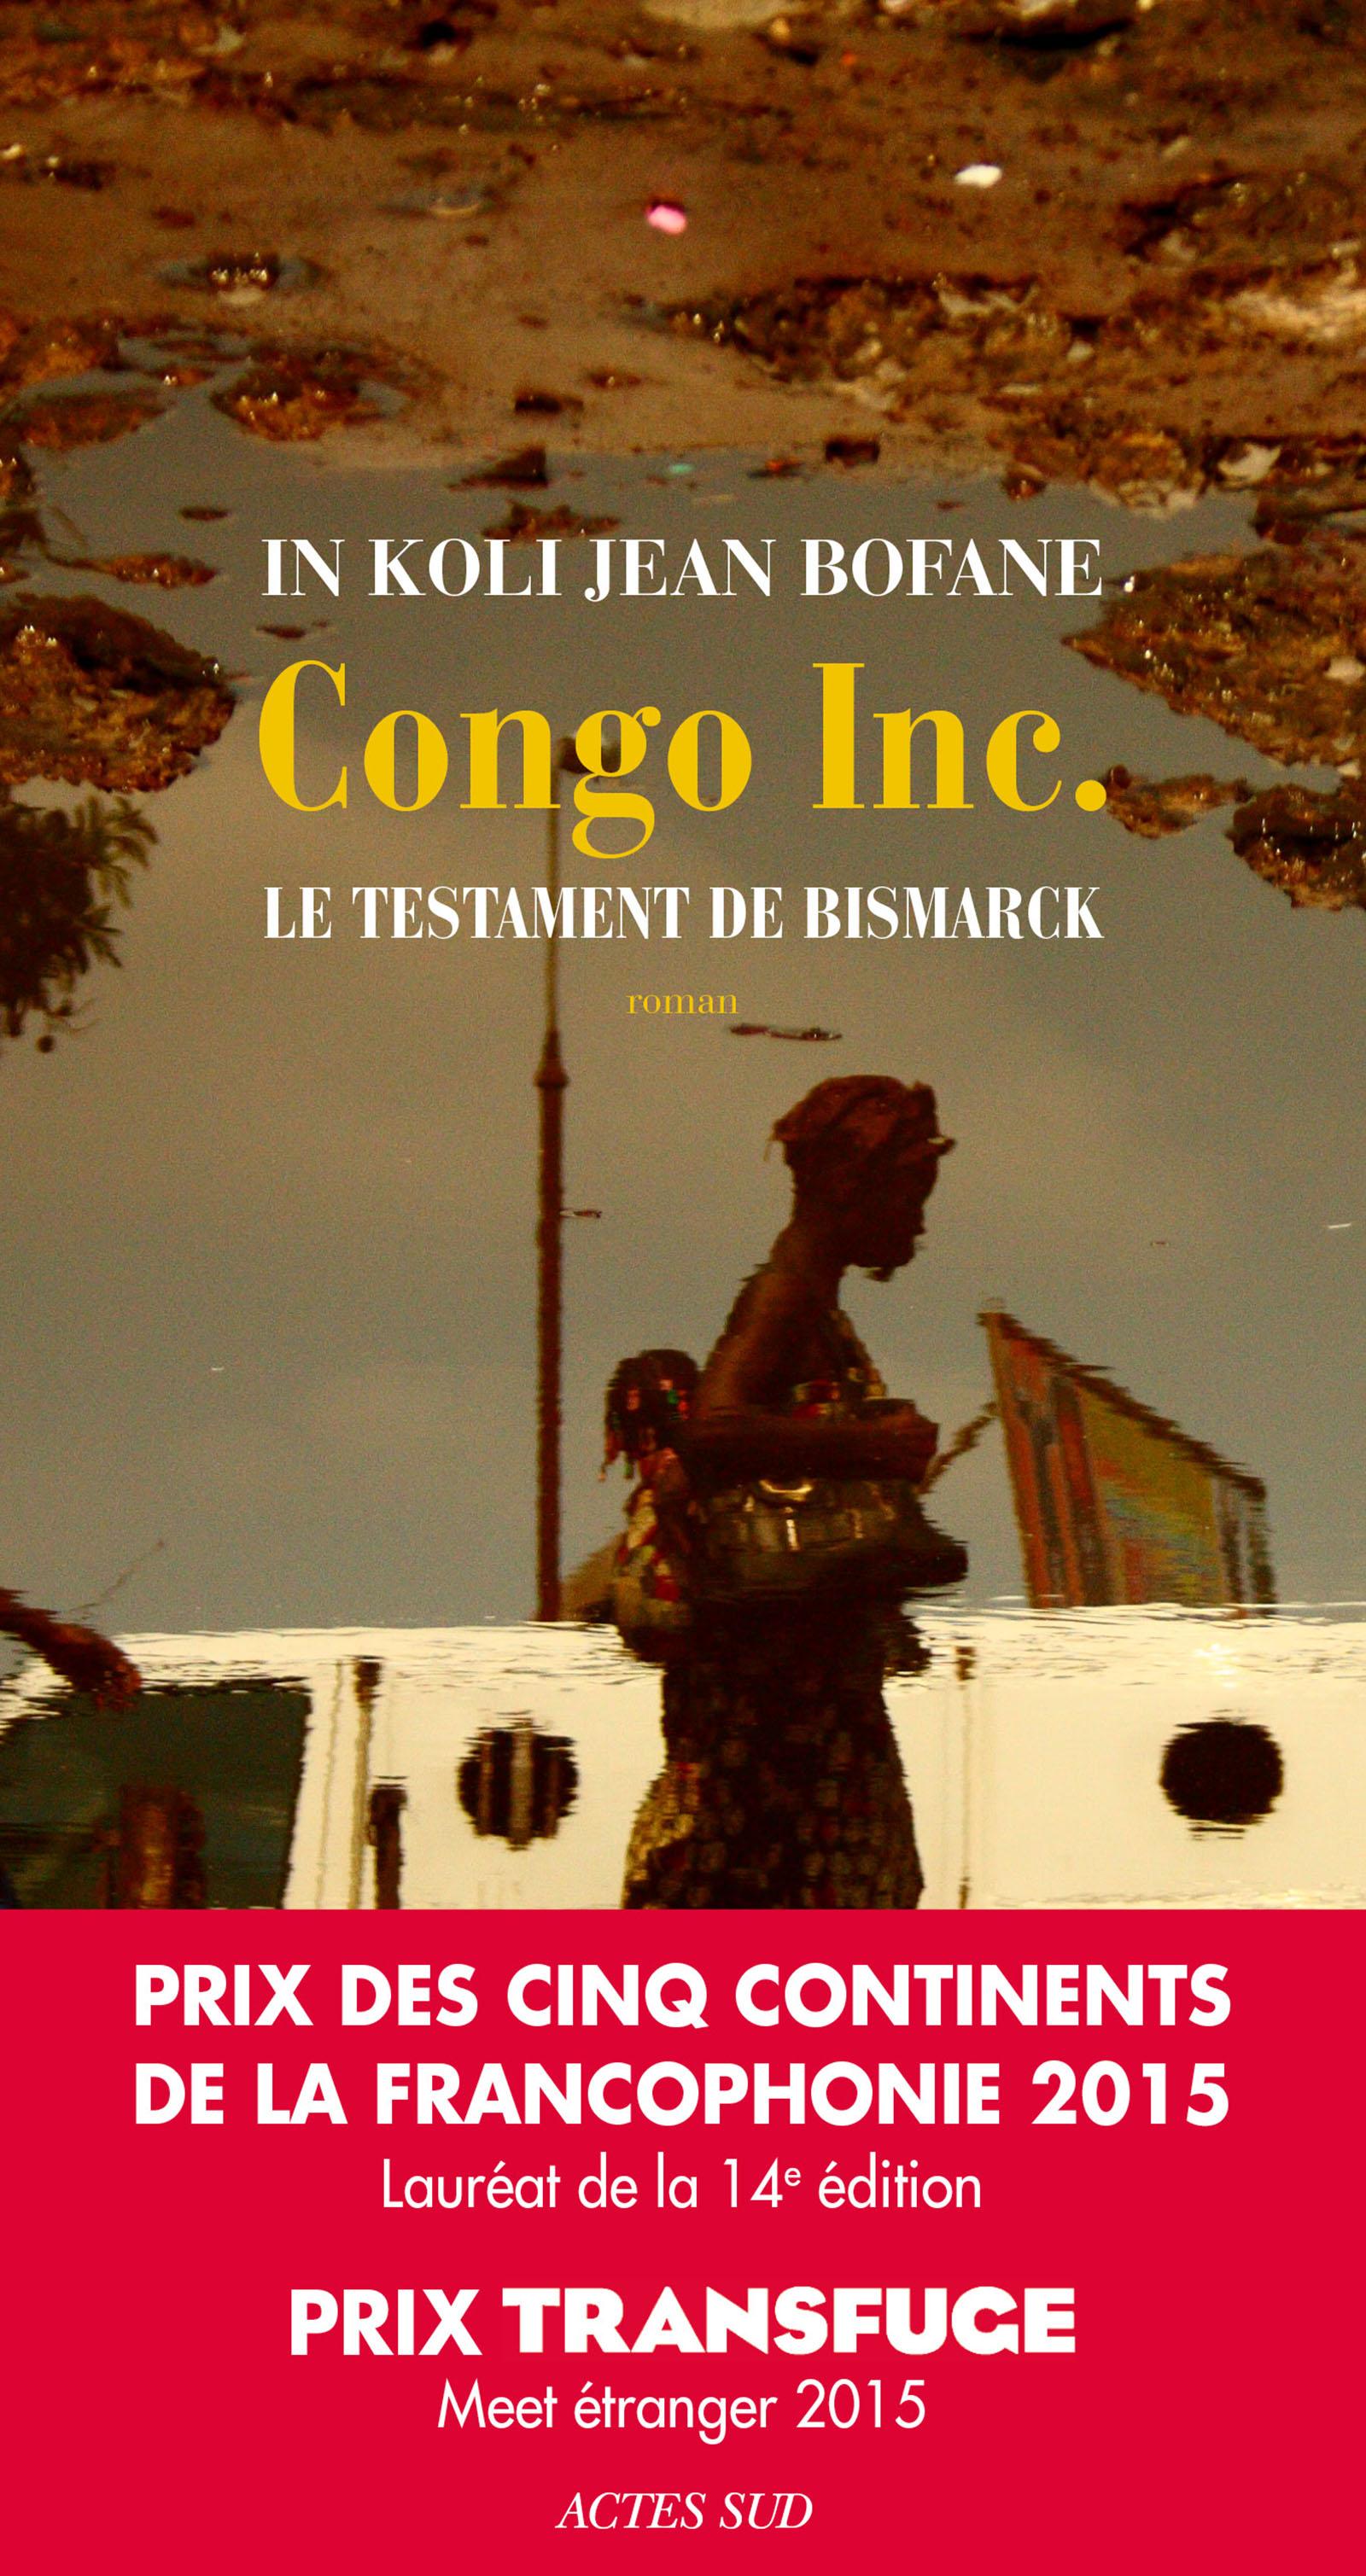 Couverture : Congo Inc.: le testament de Bismarck In Koli Jean Bofane